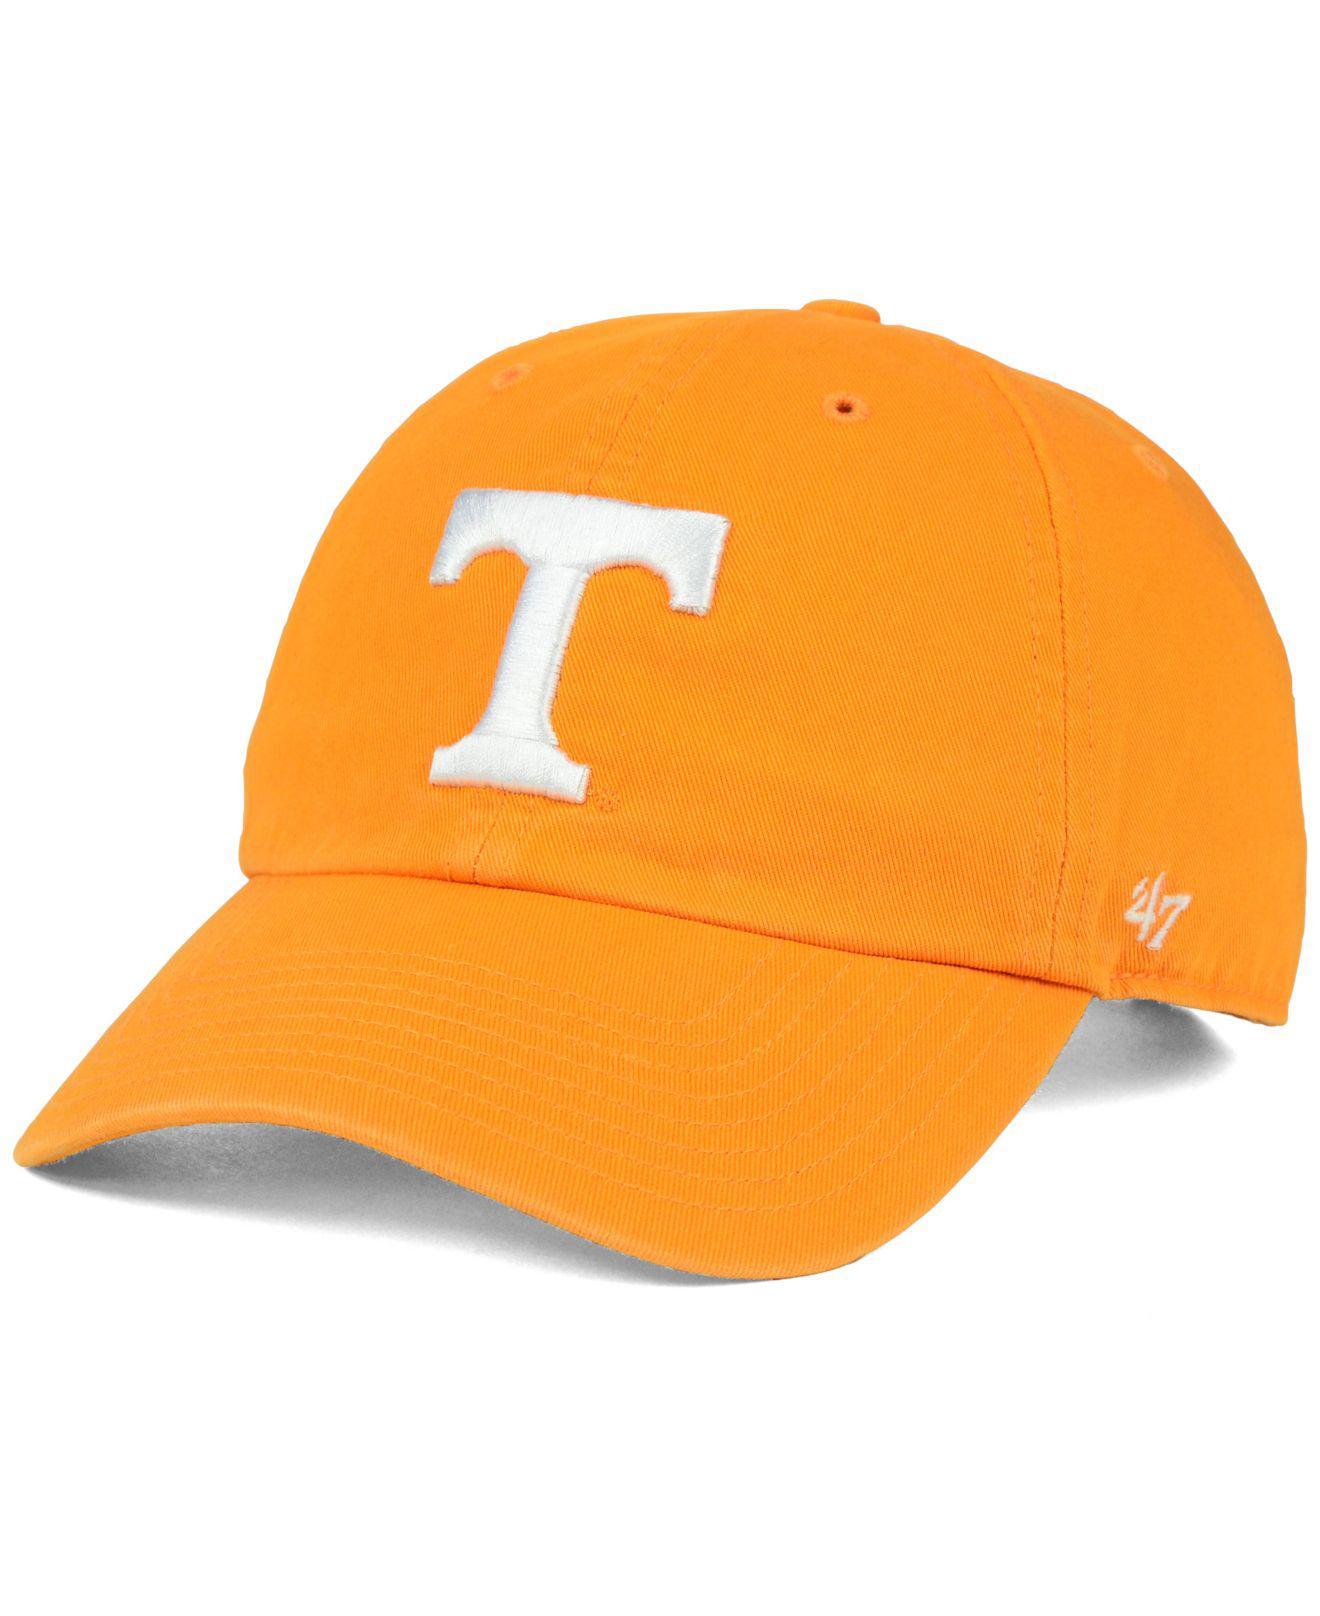 quality design 3371c 29669 47 Brand. Women s Orange Tennessee Volunteers Clean Up Cap